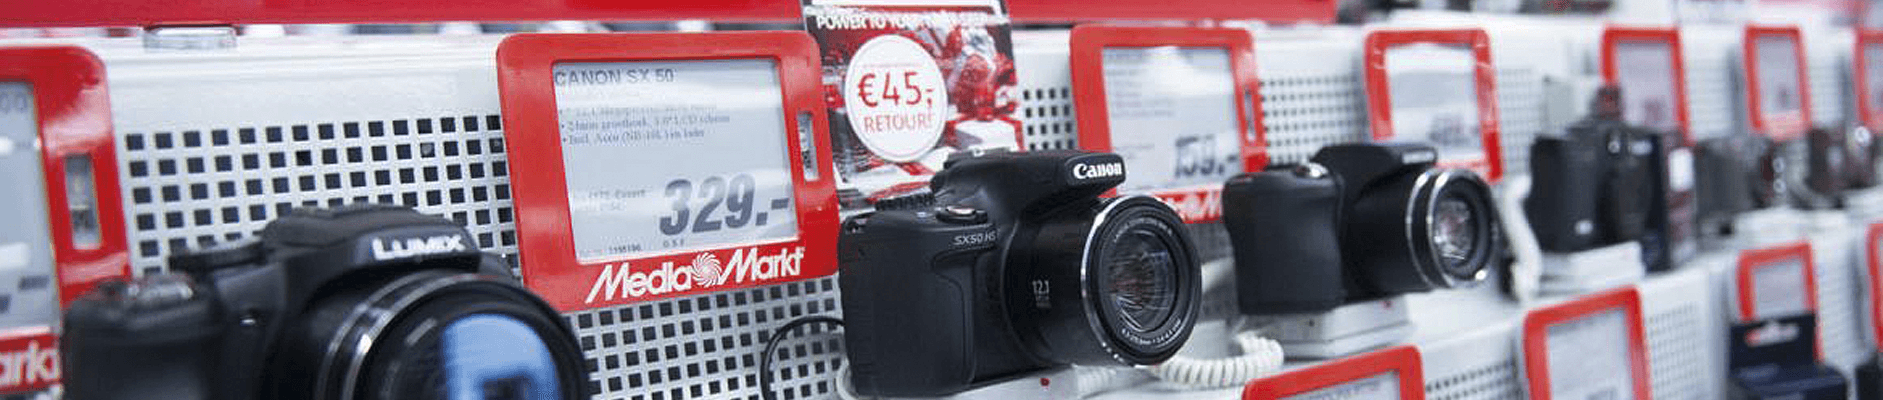 MediaMarkt SmartTAG HD110